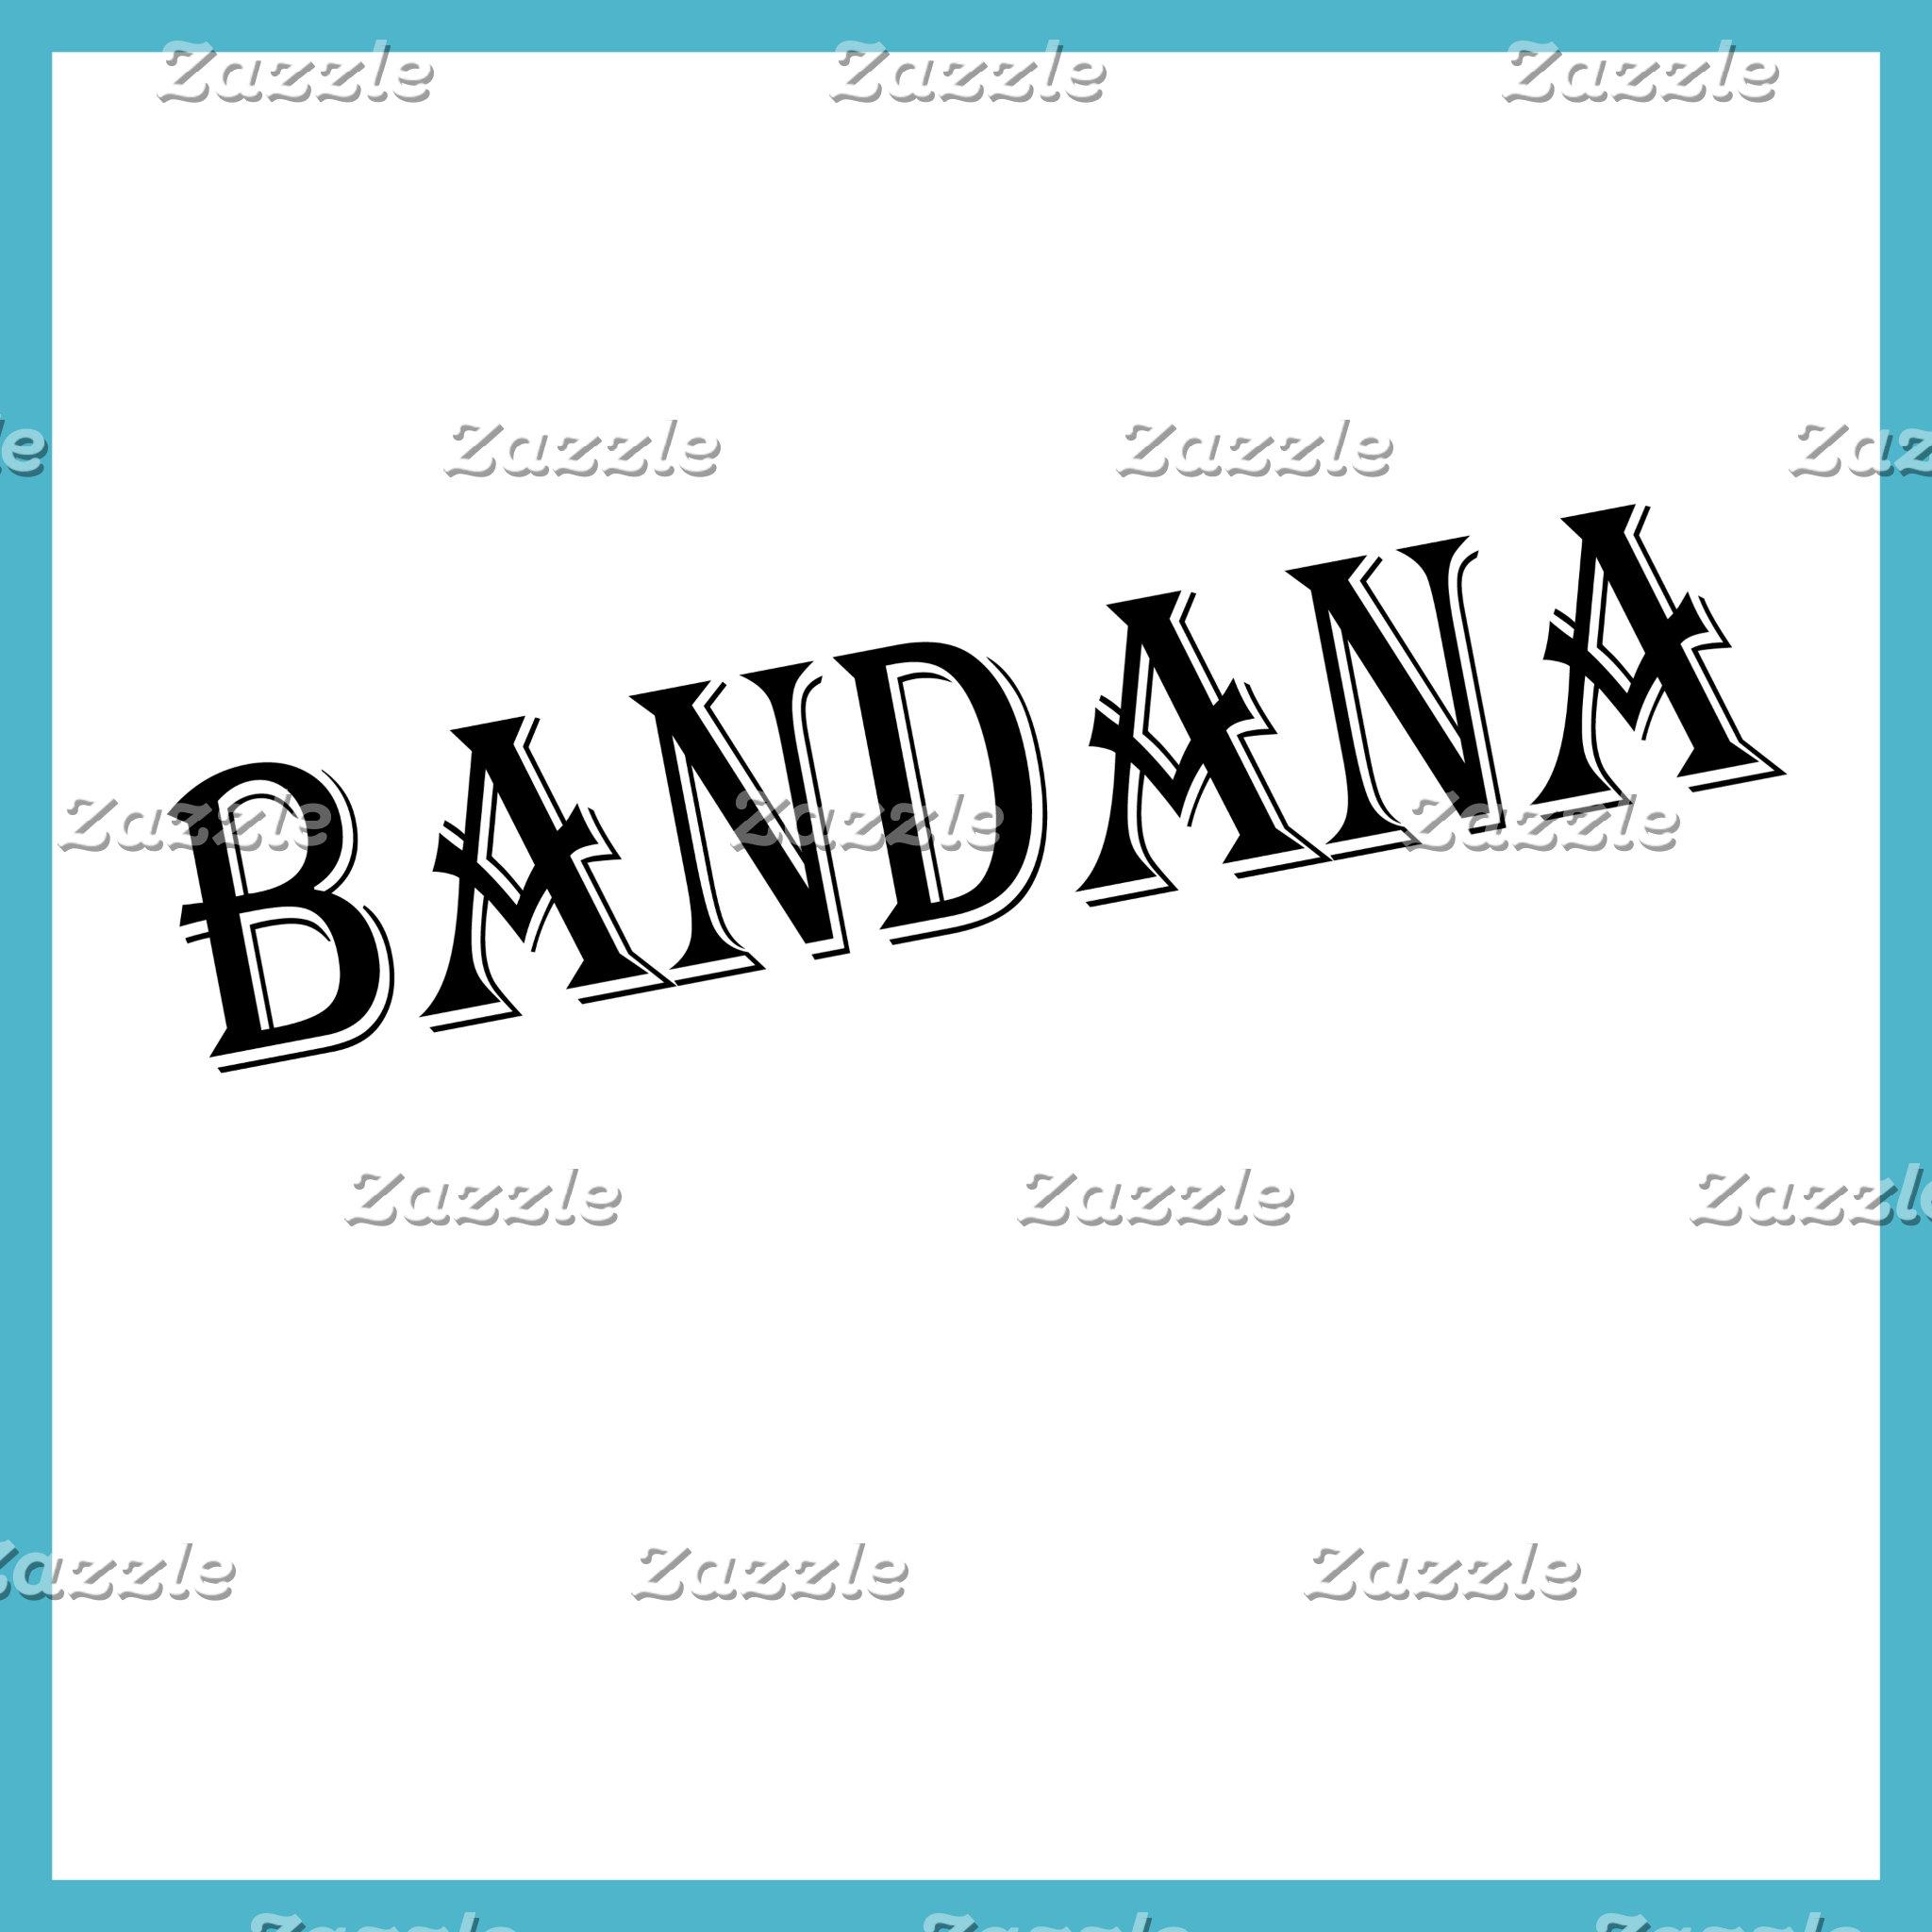 Bandanas